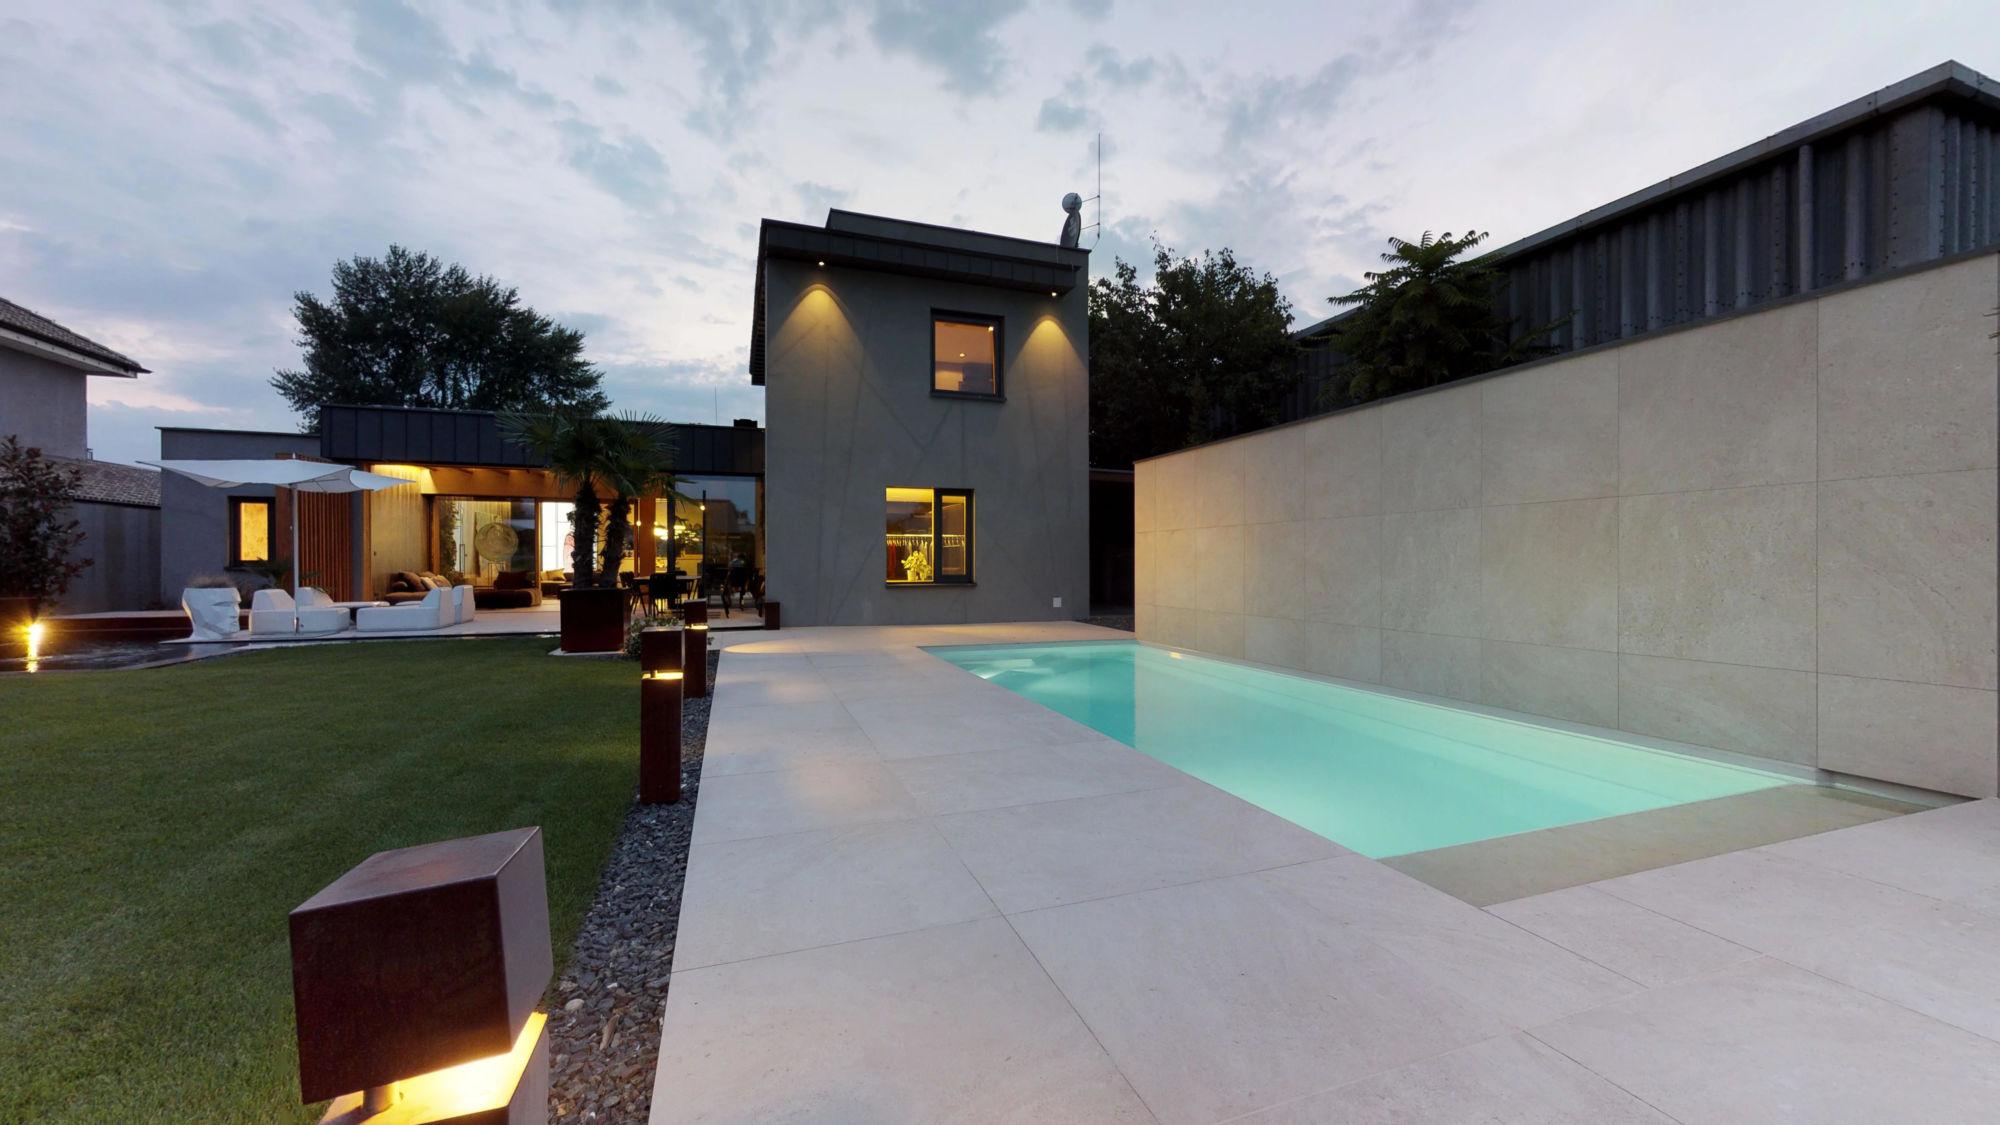 luxusny rodinny dom Kralova pri senci